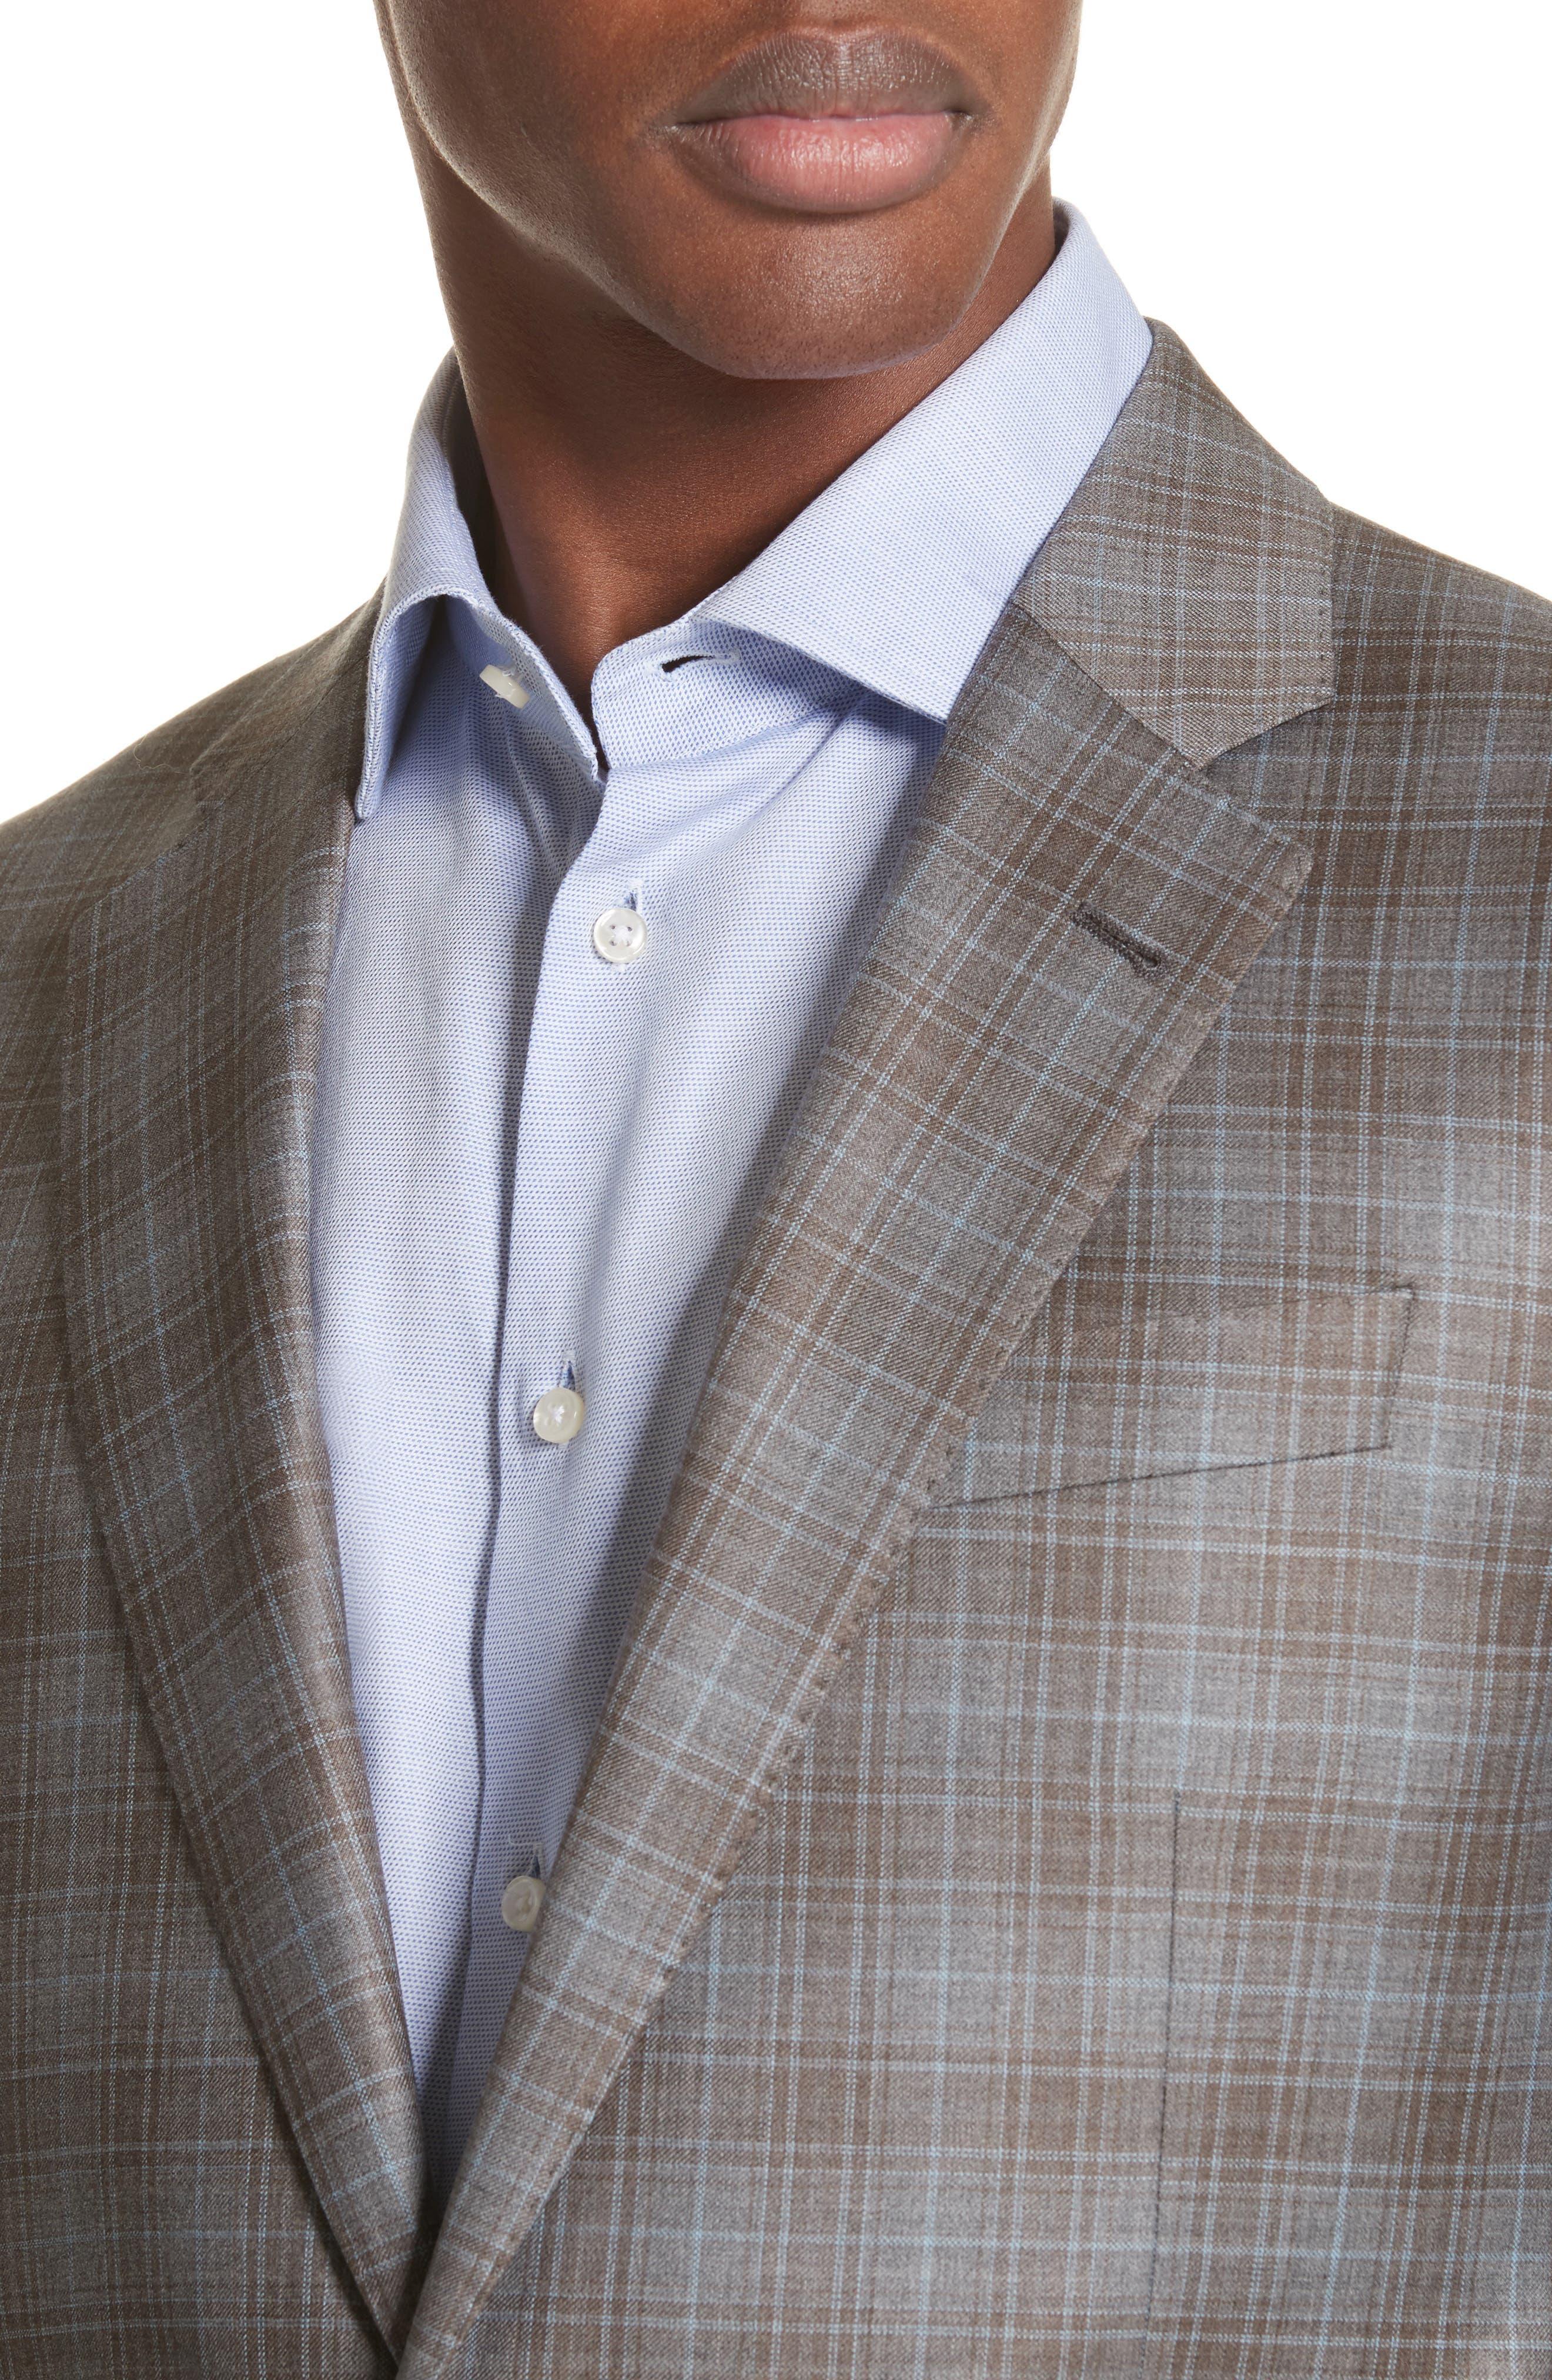 G-Line Trim Fit Plaid Wool Sport Coat,                             Alternate thumbnail 4, color,                             Tan